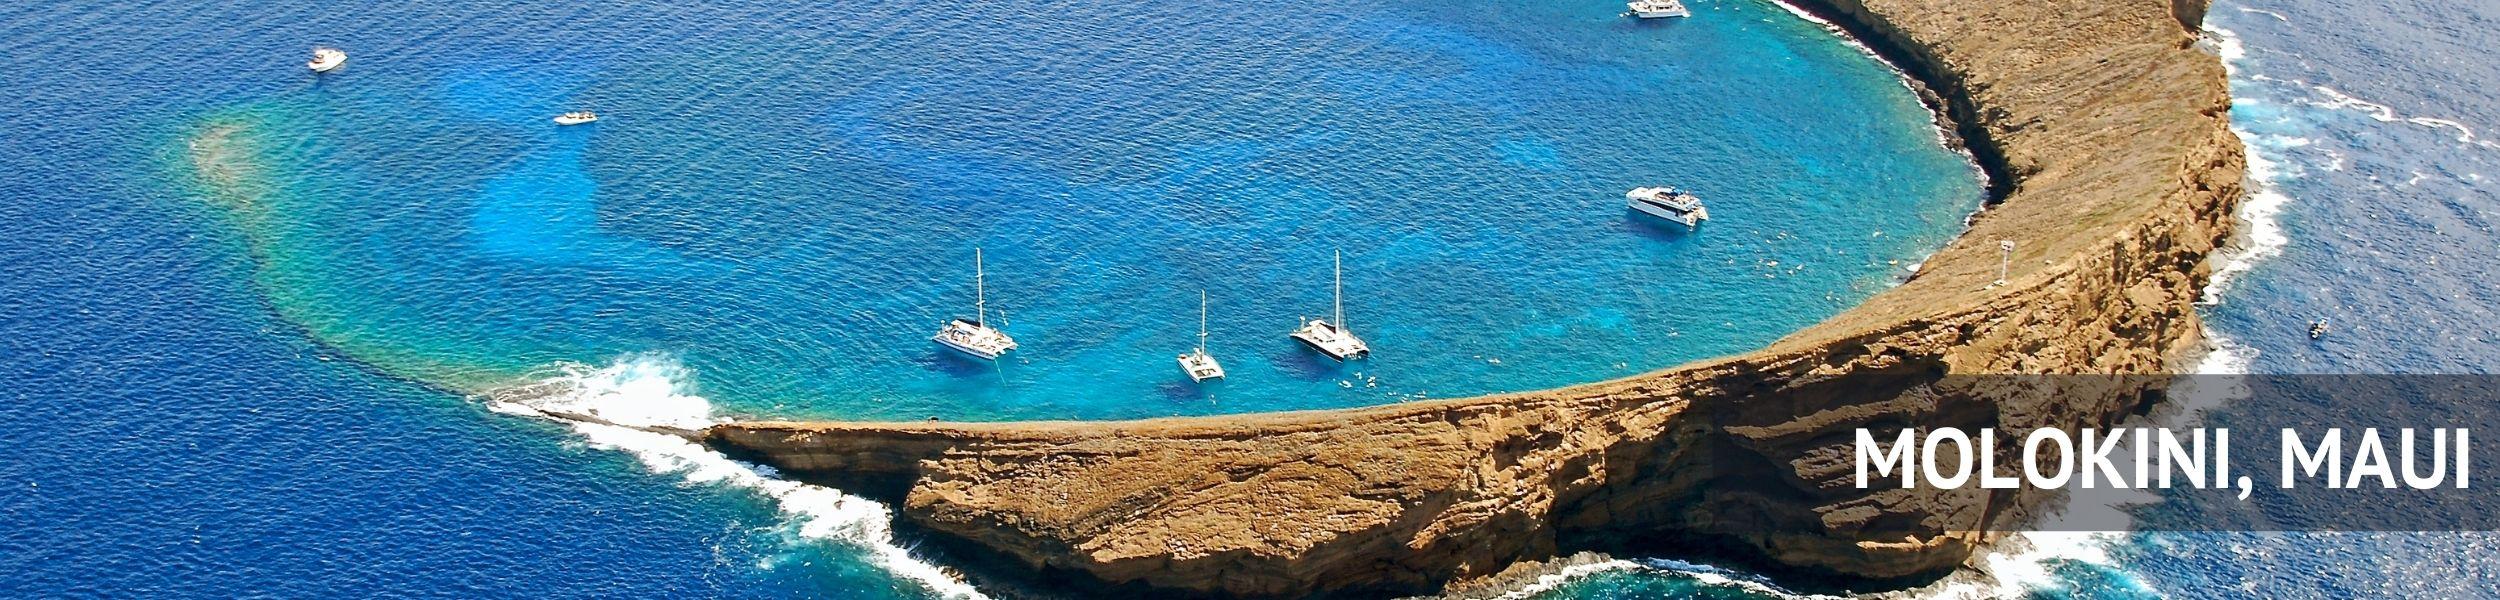 Molokini Snorkeling Maui